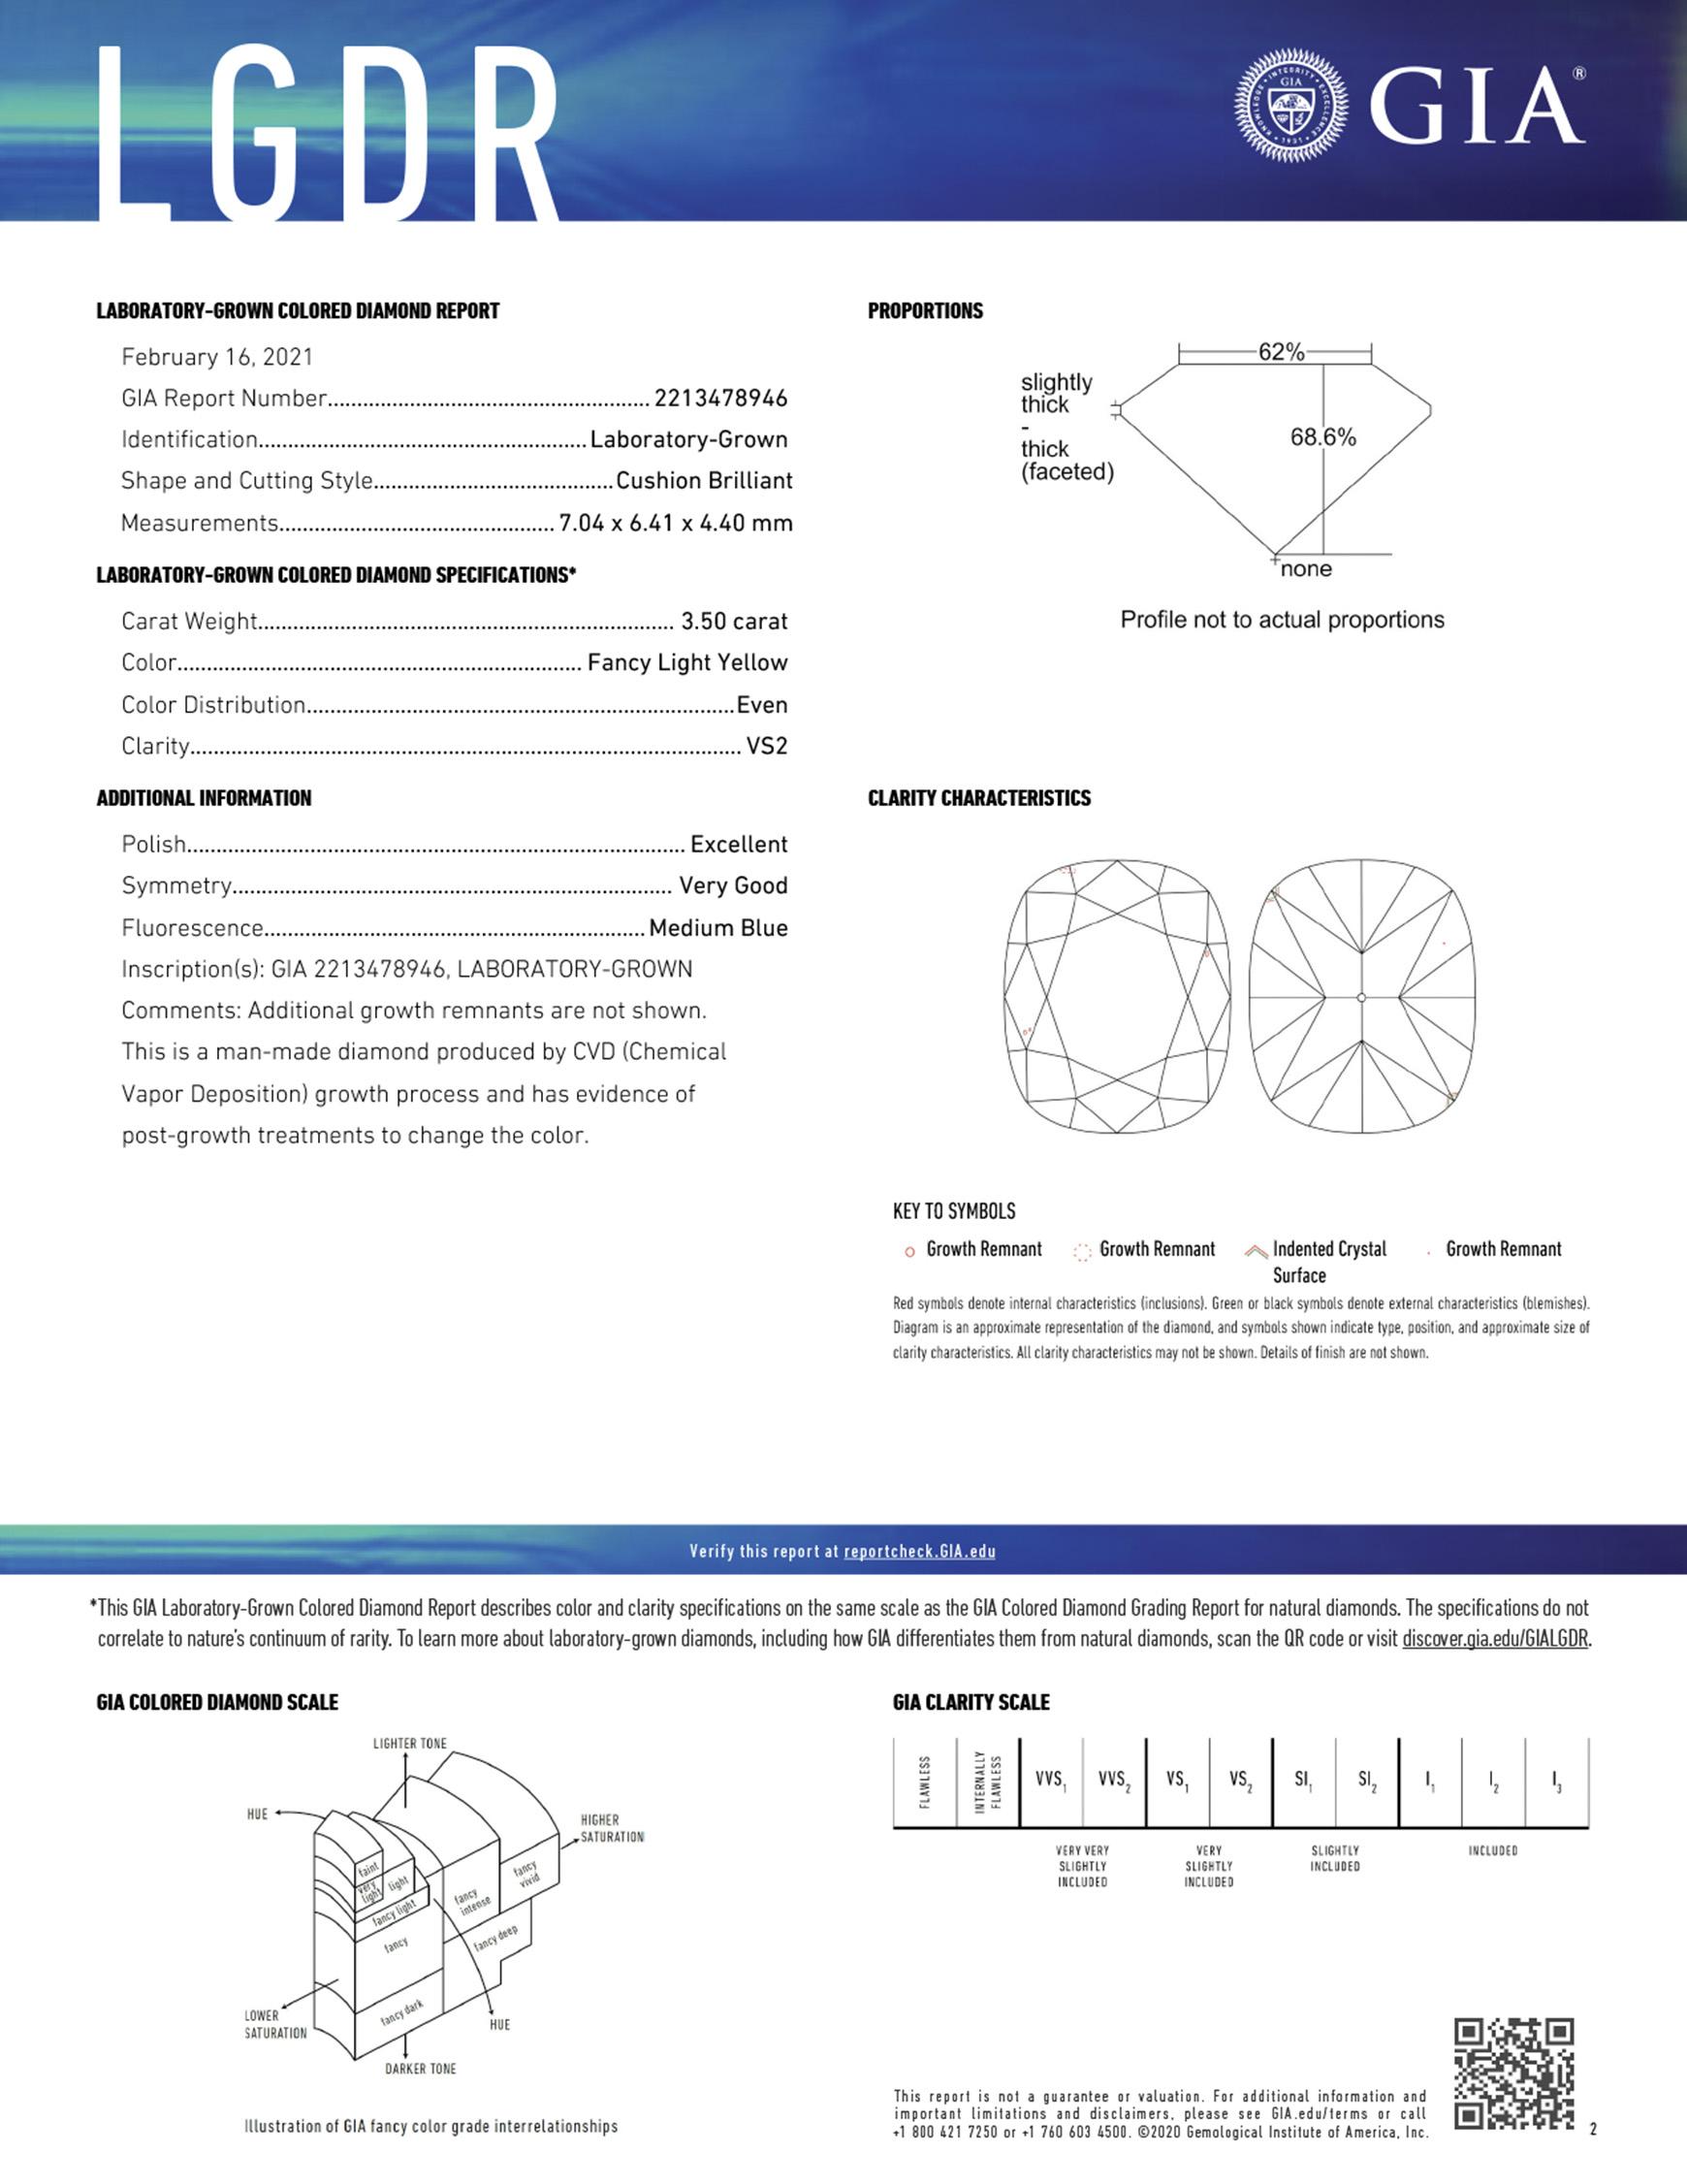 Sample Laboratory Grown Colored Diamond Report